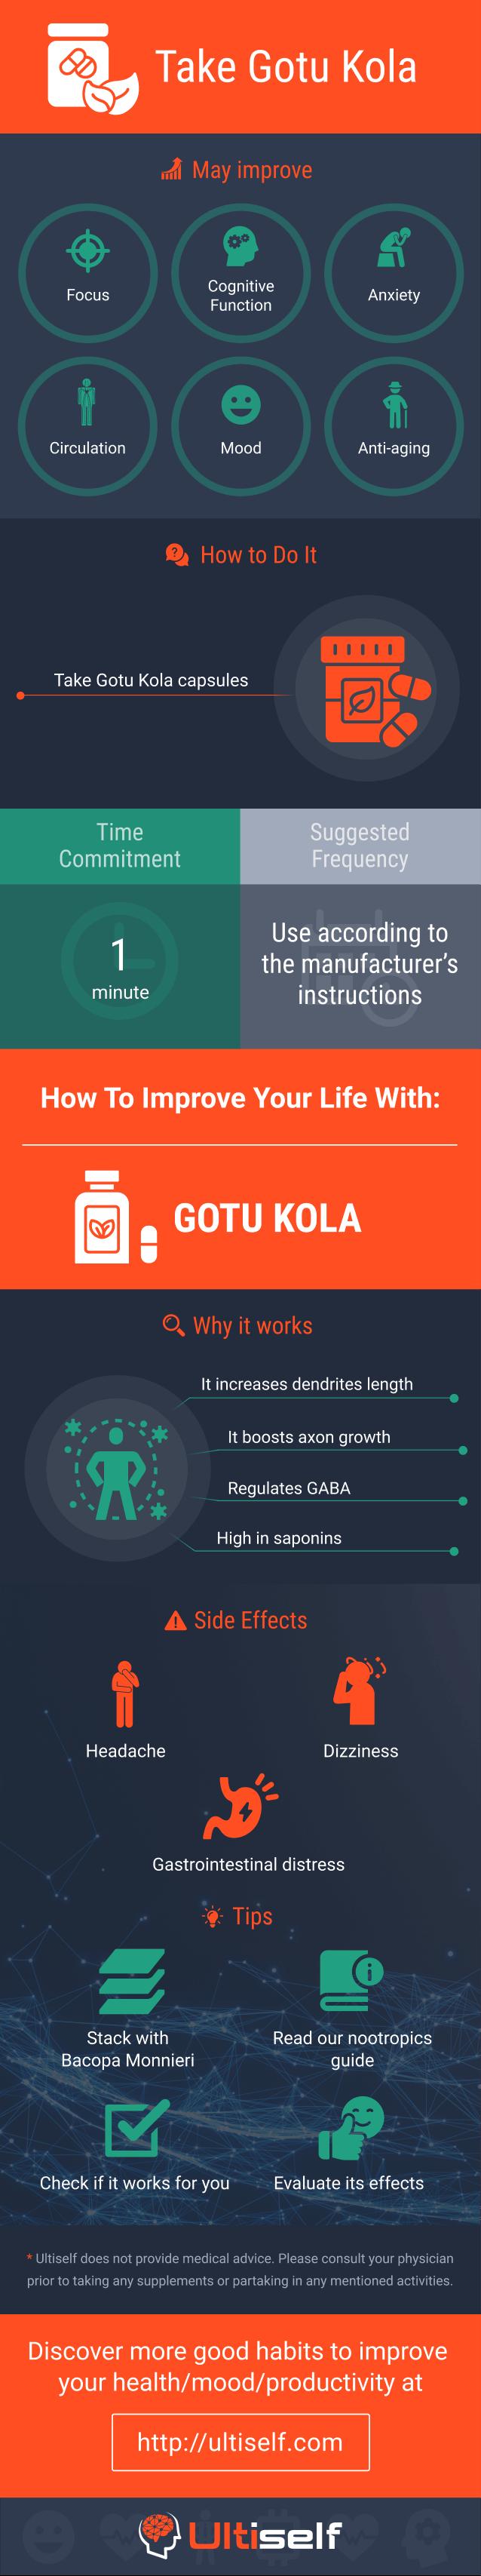 Take Gotu Kola infographic